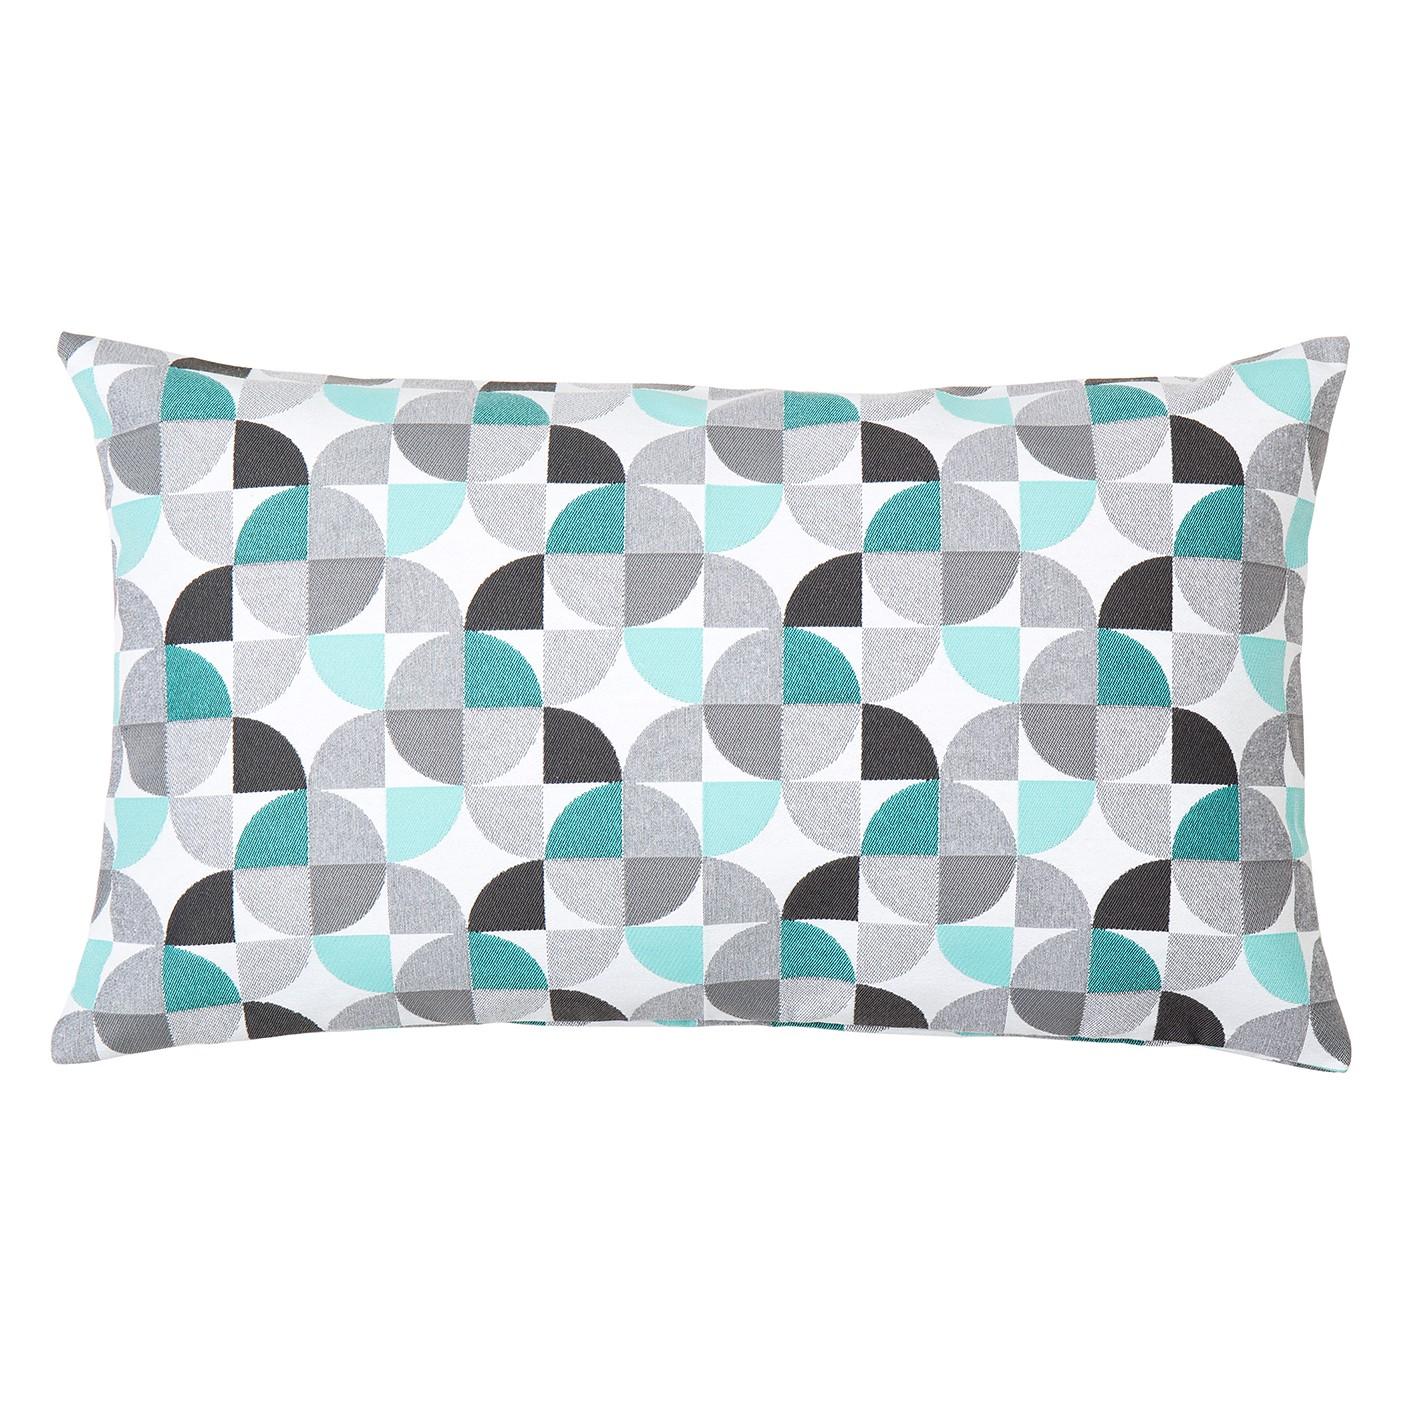 kissen quadrant mischgewebe mehrfarbig 30 x 50 cm kaufen. Black Bedroom Furniture Sets. Home Design Ideas